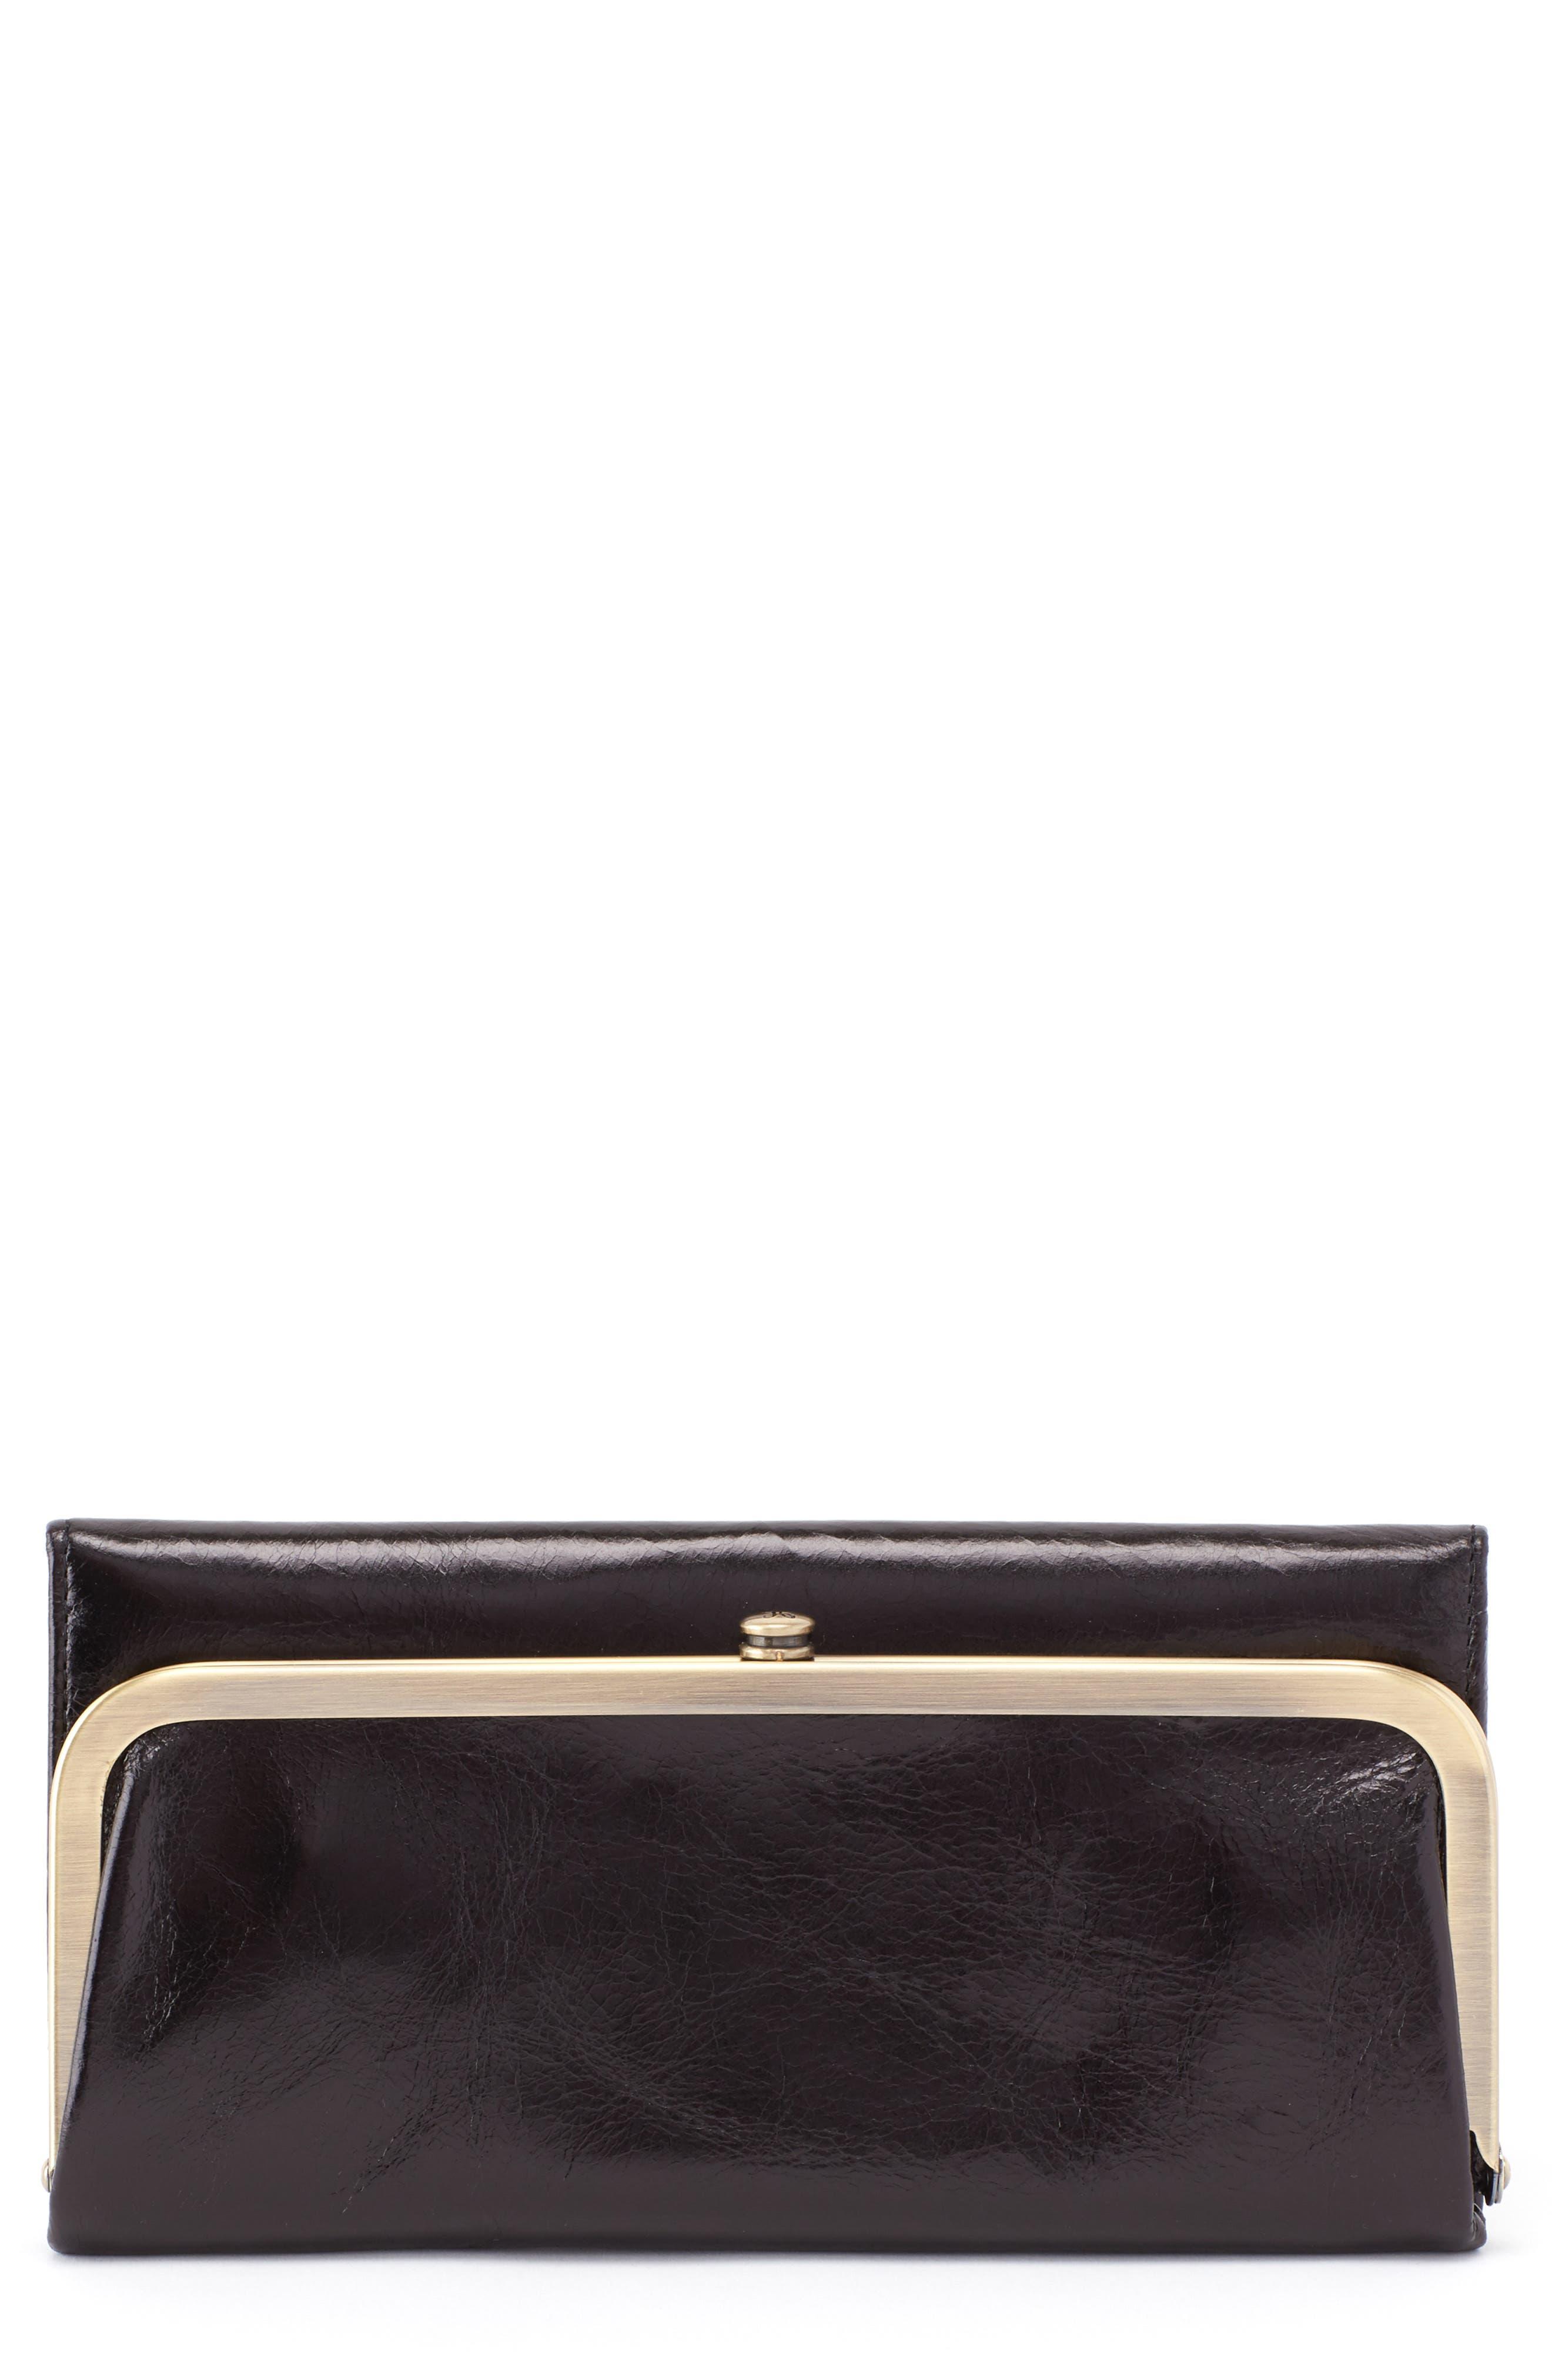 Rachel Frame Wallet,                         Main,                         color, BLACK